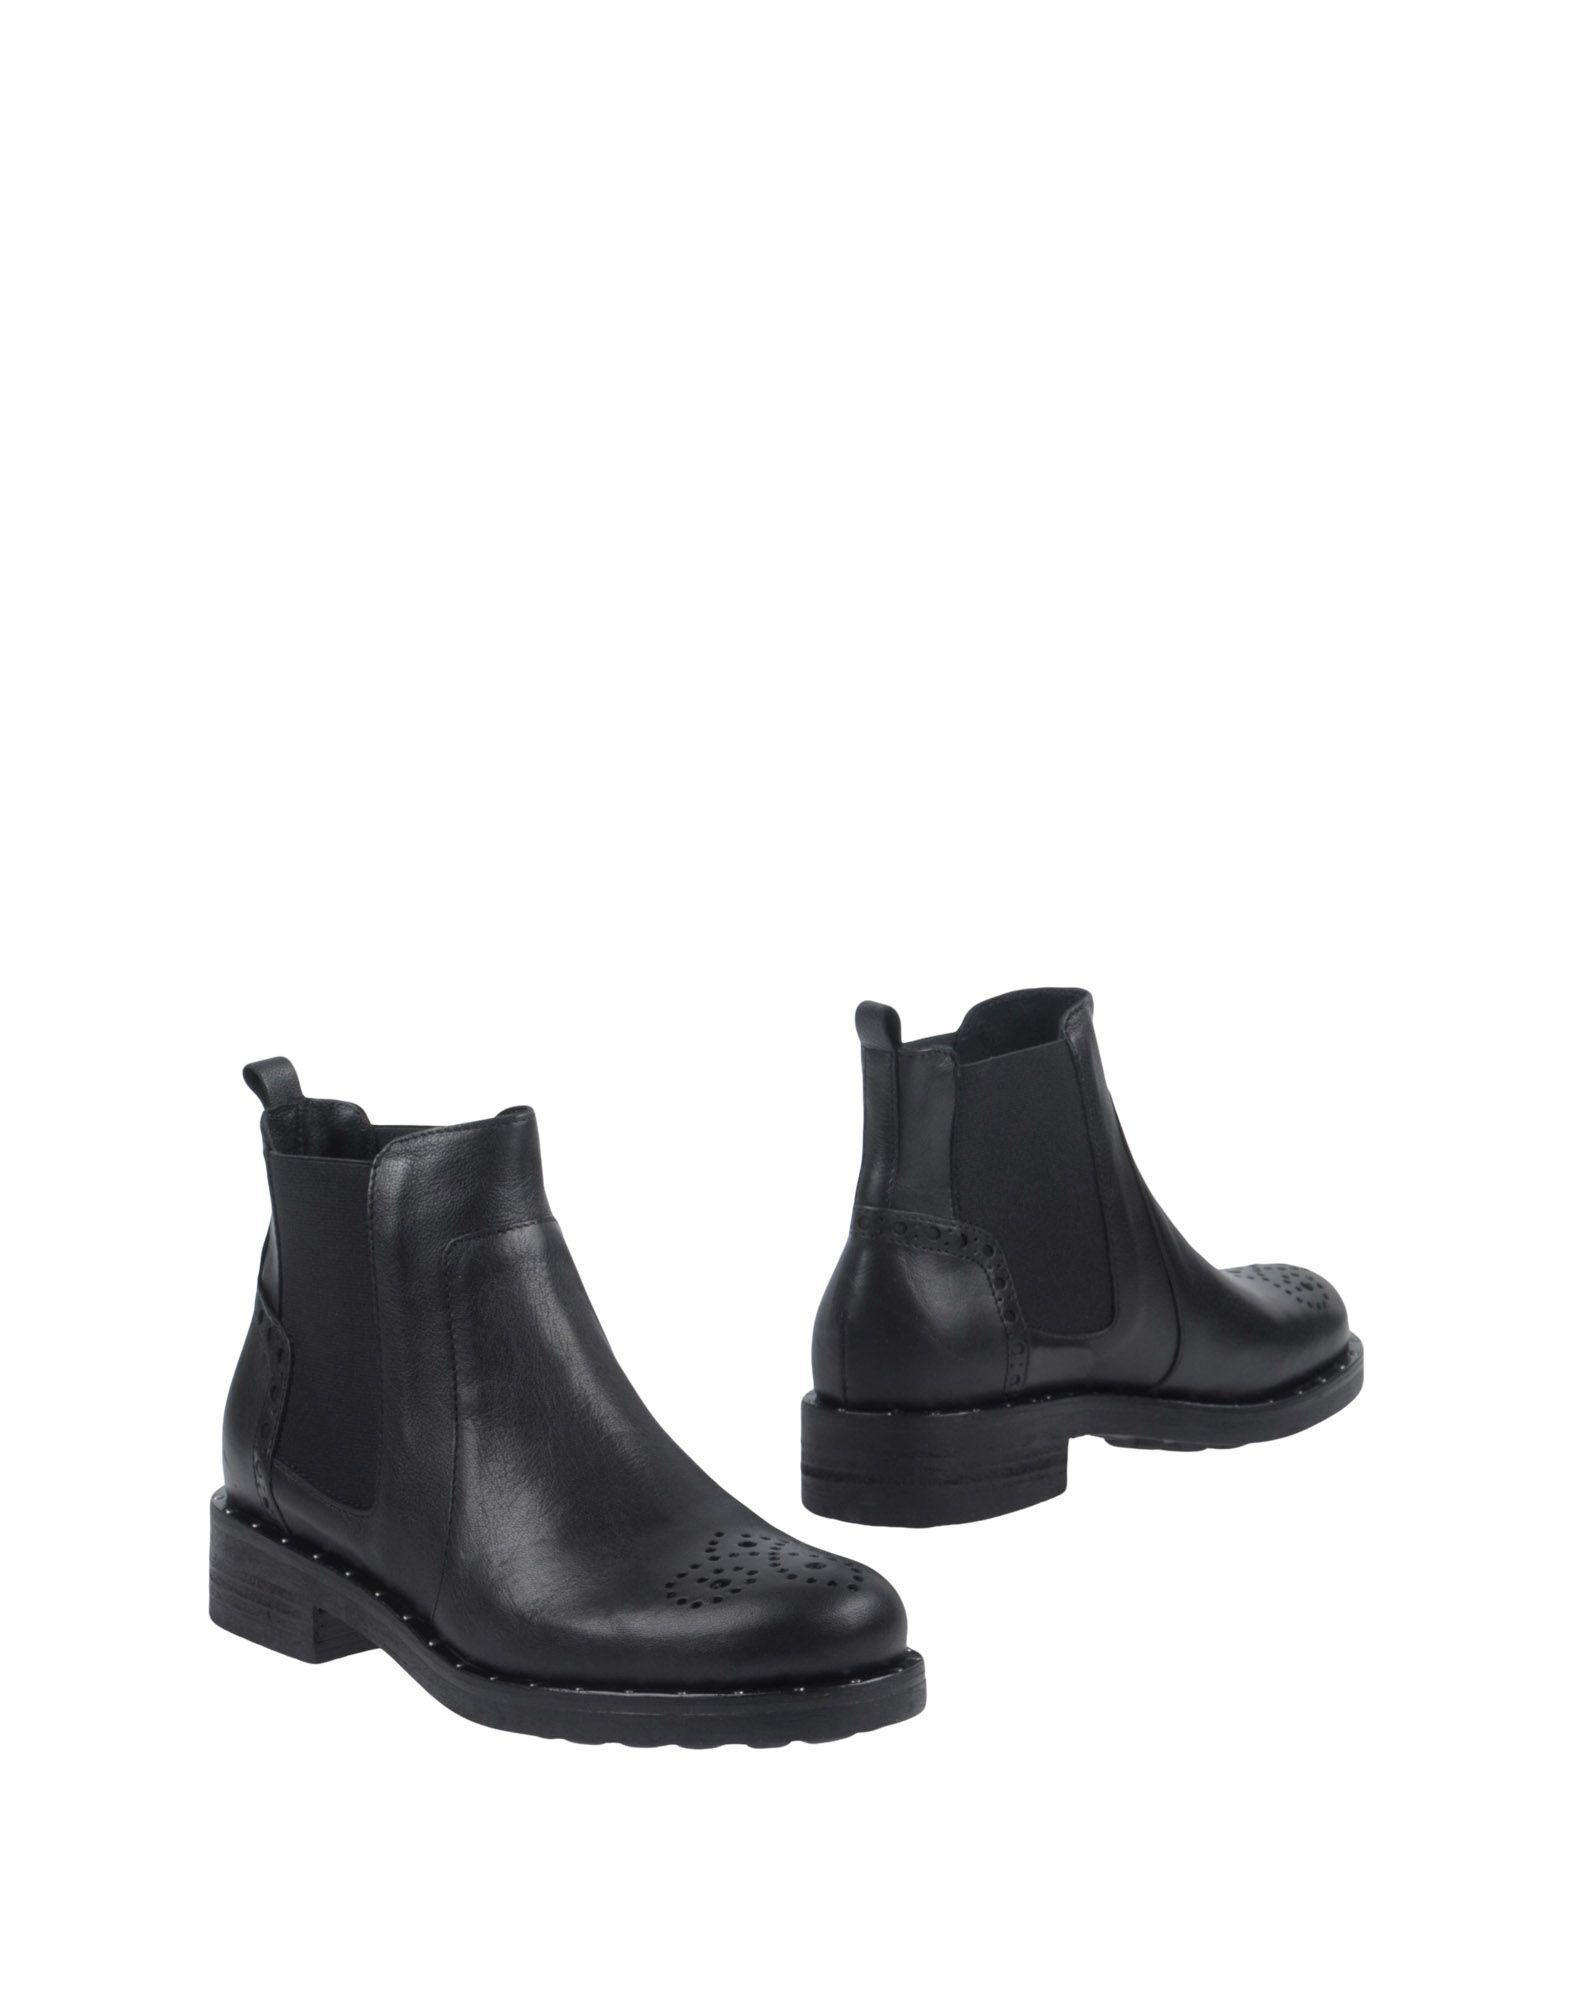 Emanuela Passeri Chelsea Boots Damen  Schuhe 11444677UO Gute Qualität beliebte Schuhe  0180c3